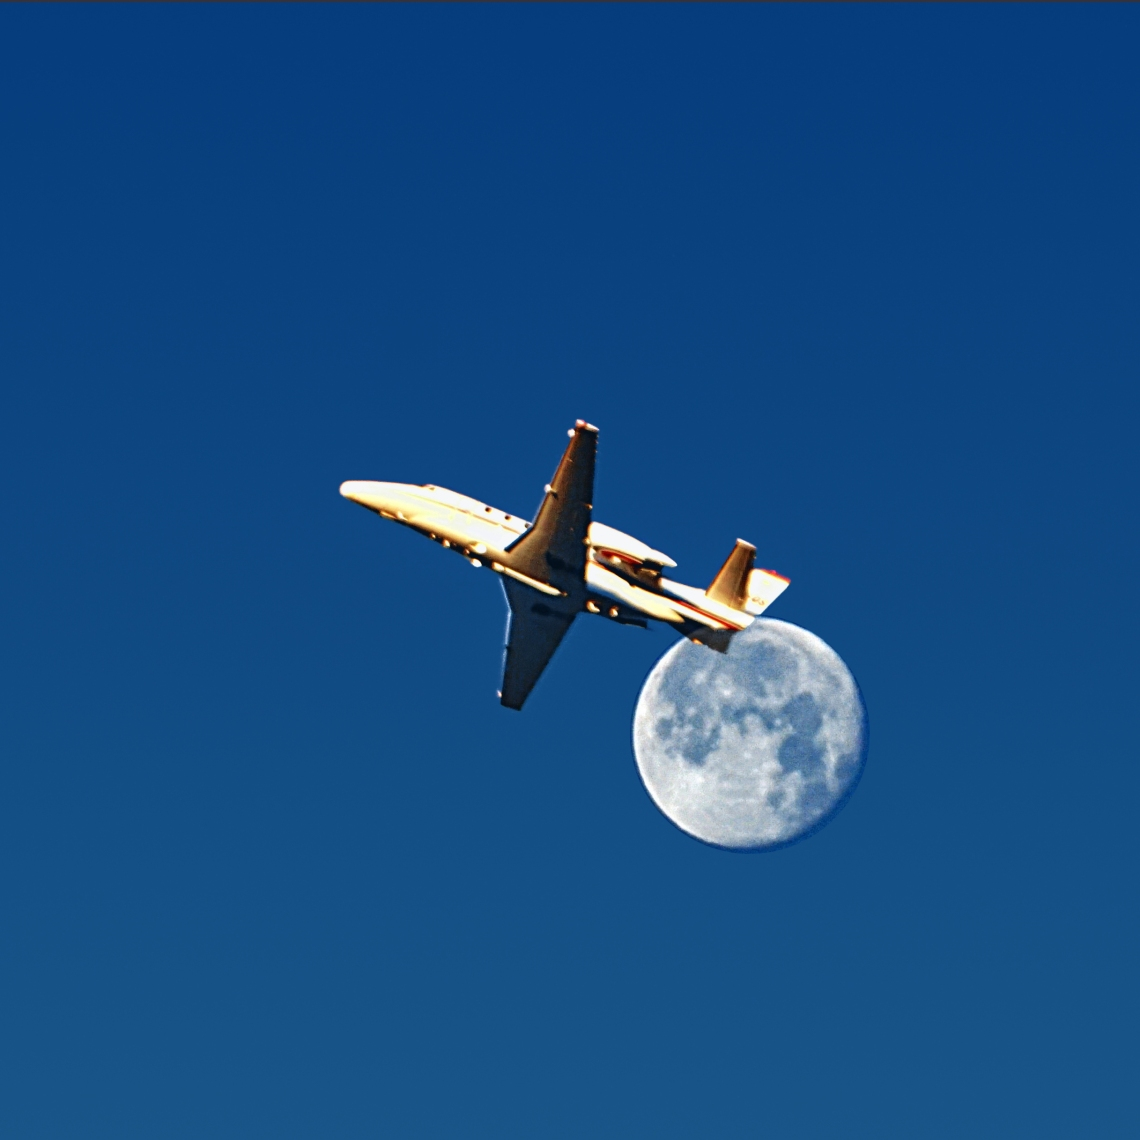 00-morningfullmoon-plane-DSC03882A